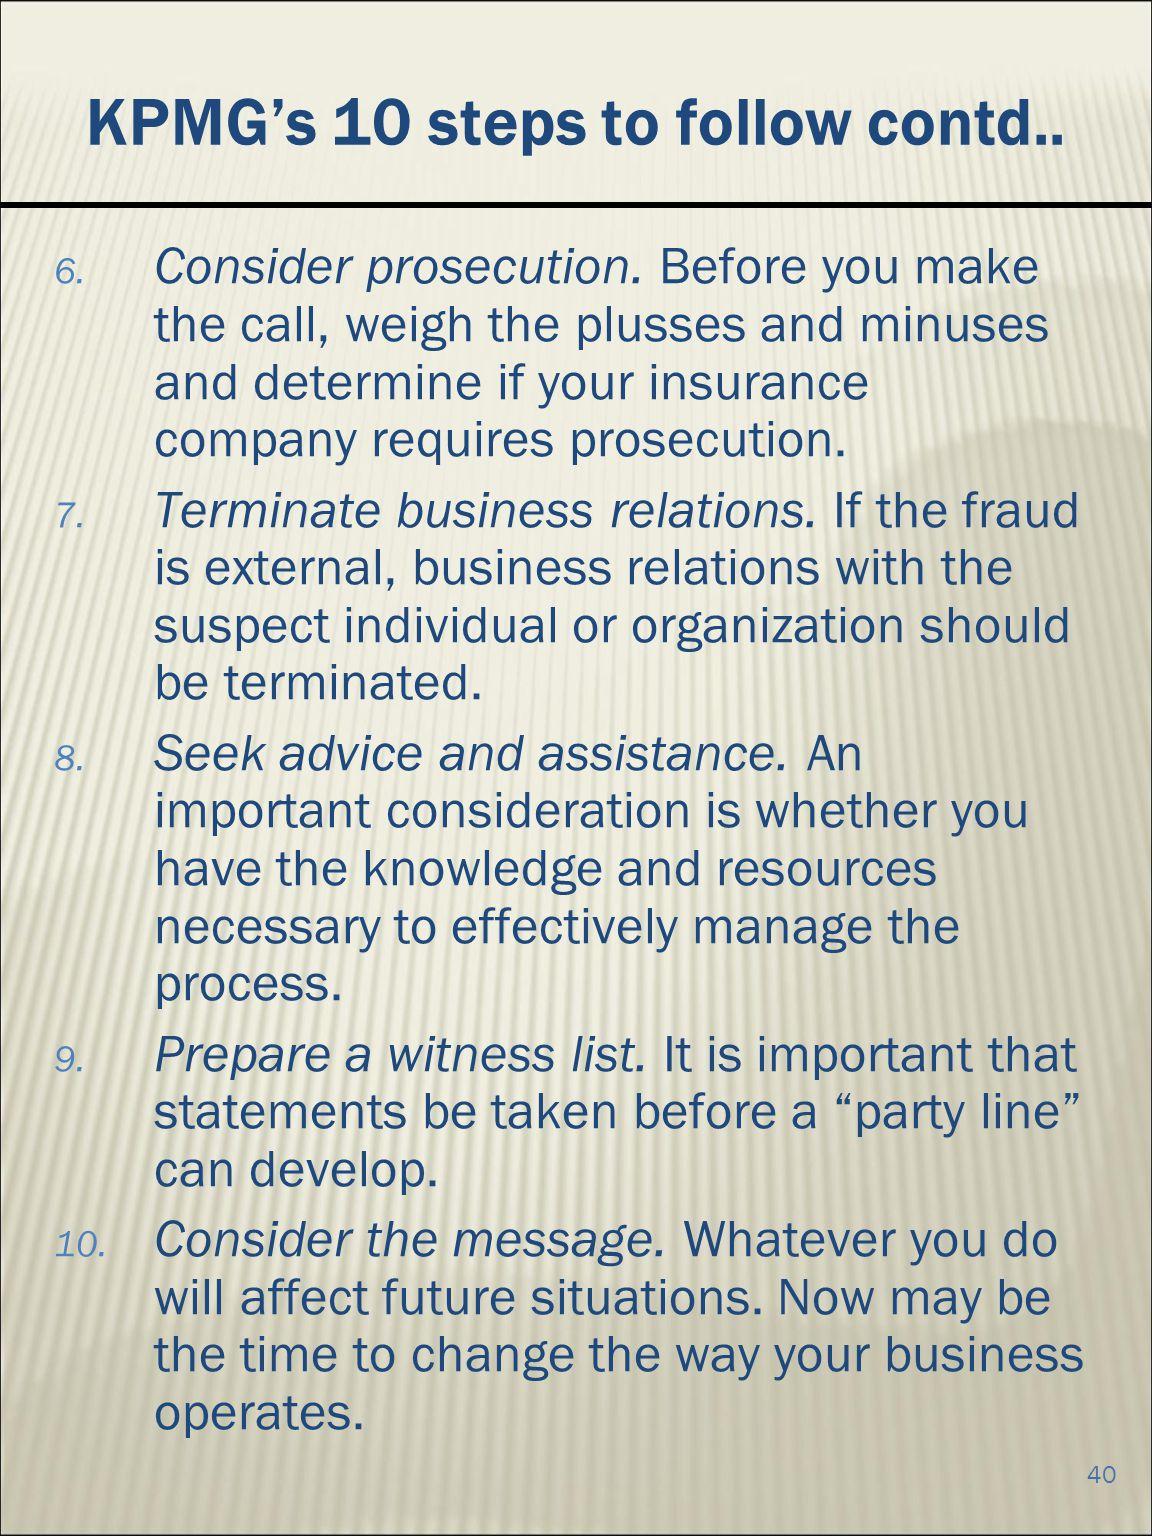 KPMG's 10 steps to follow contd..